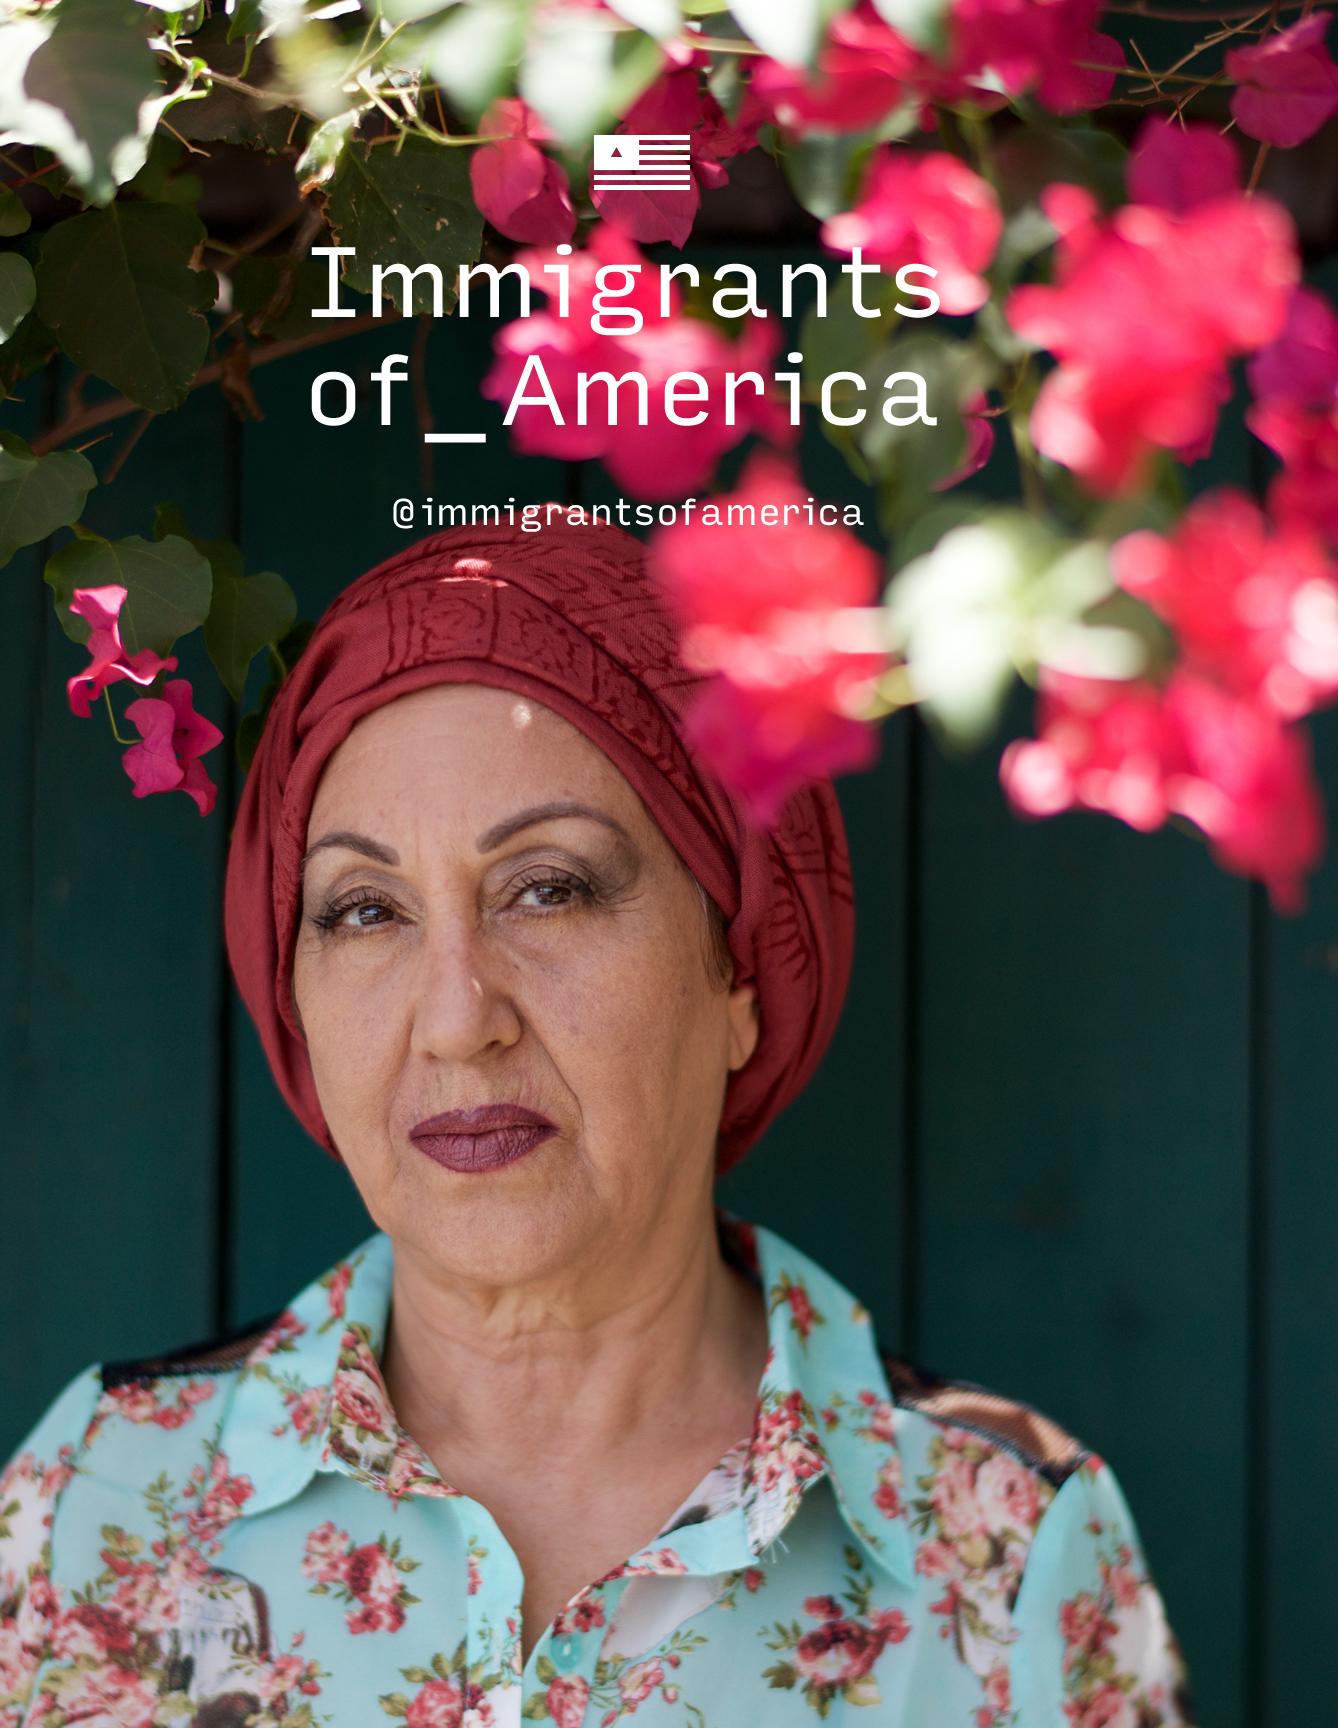 Immigrants-of-Am-002 (1).jpg